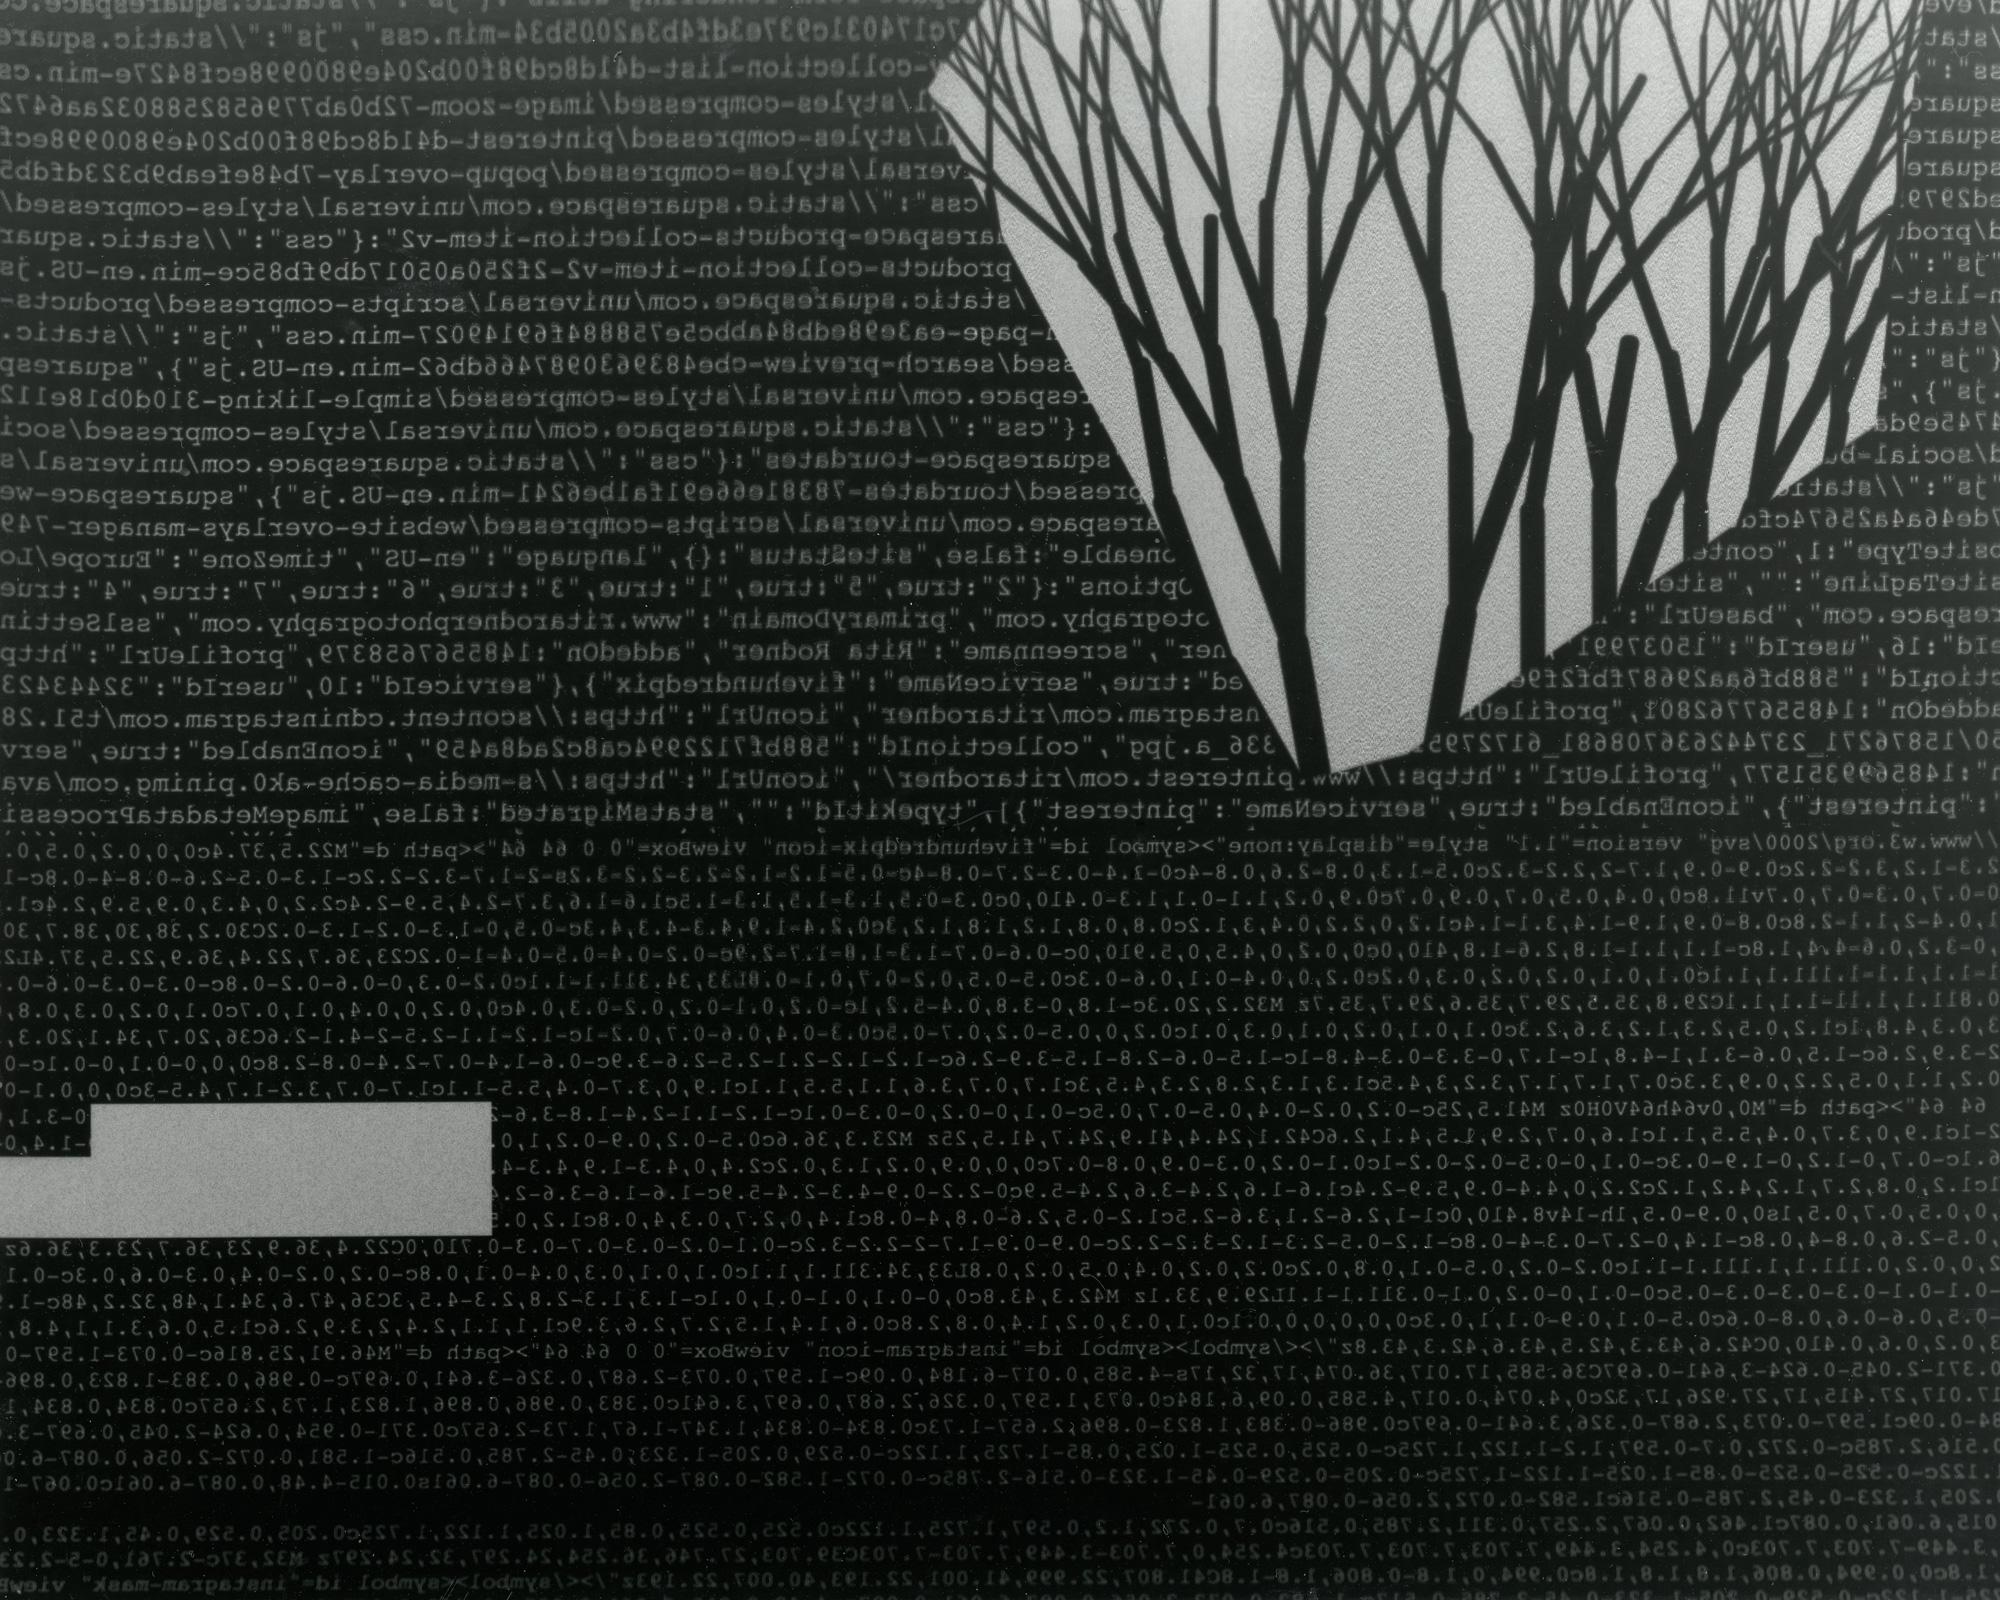 Code-tree.jpg